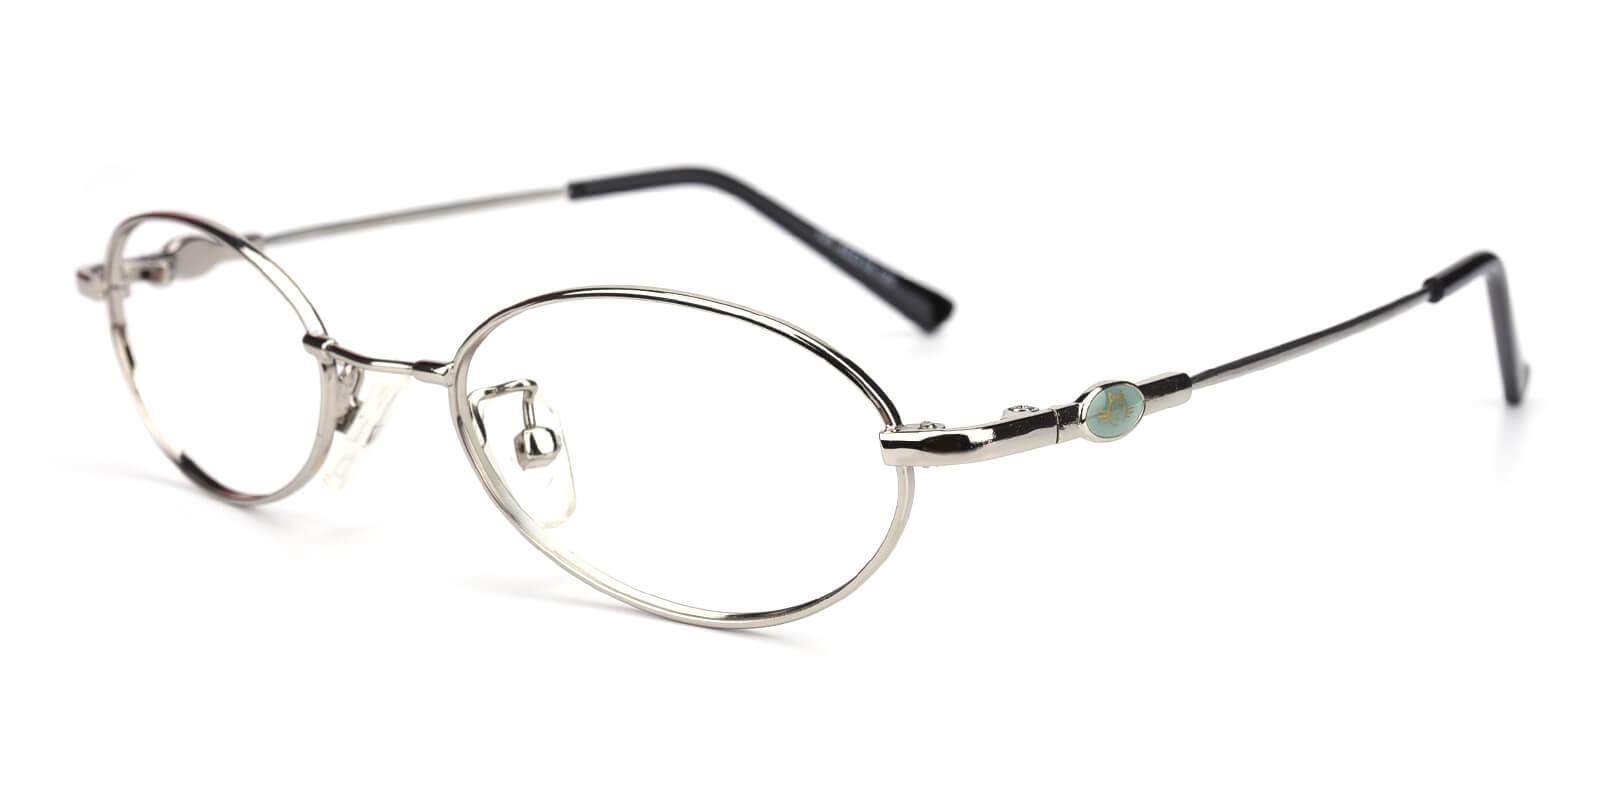 Mikestar-Silver-Oval-Titanium-Eyeglasses-additional1